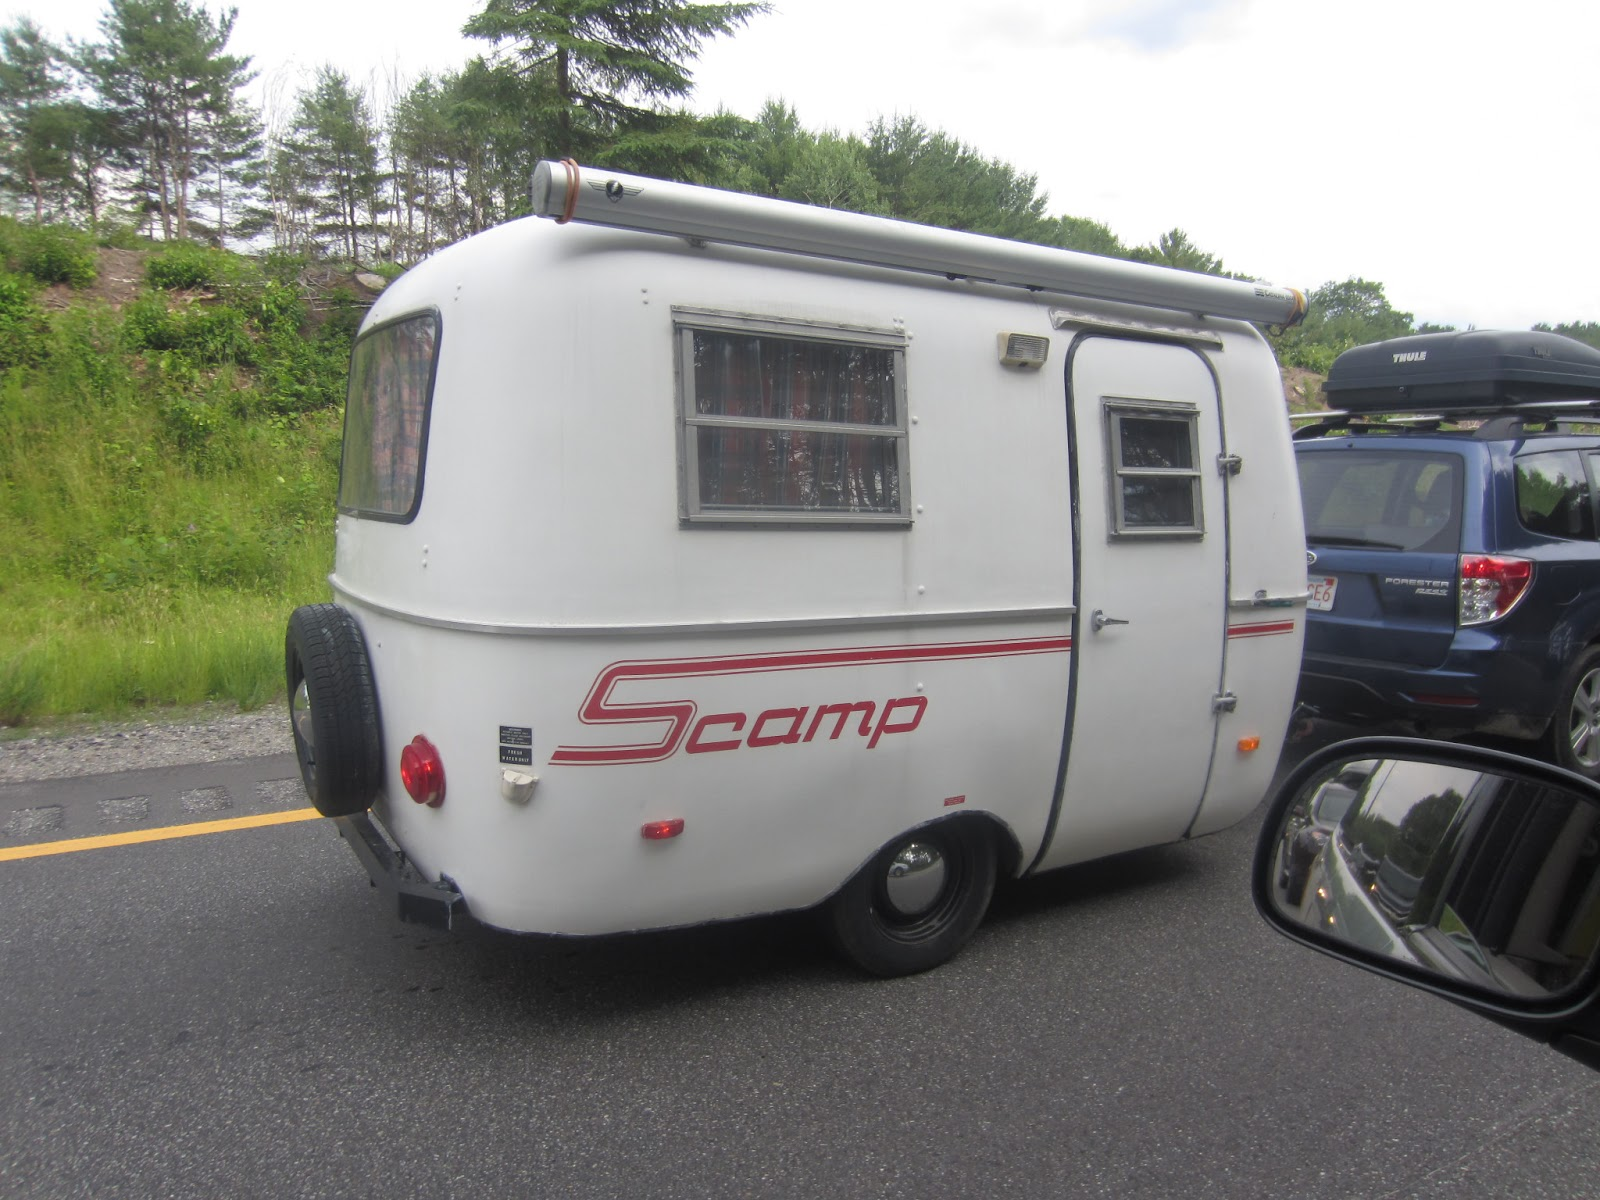 Scamp Travel Trailer For Sale In Los Angeles Ca Los